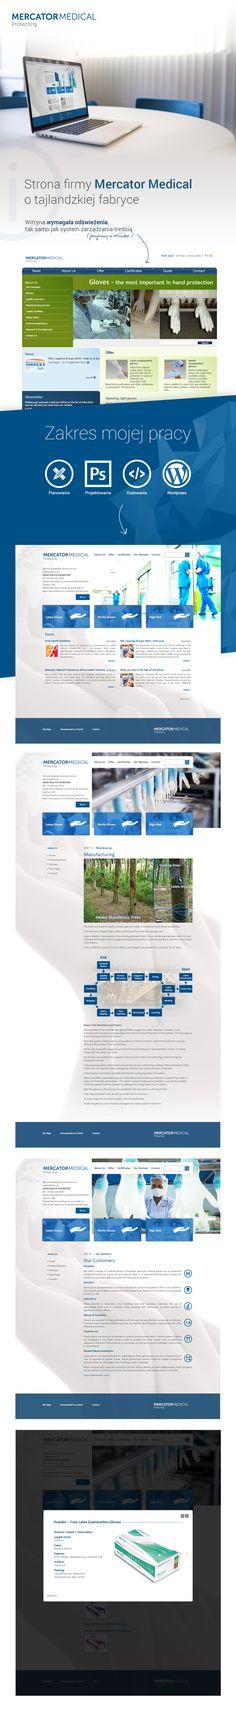 Mercator Medical Thailand | Webdesign | Wordpress | Design | Web graphics